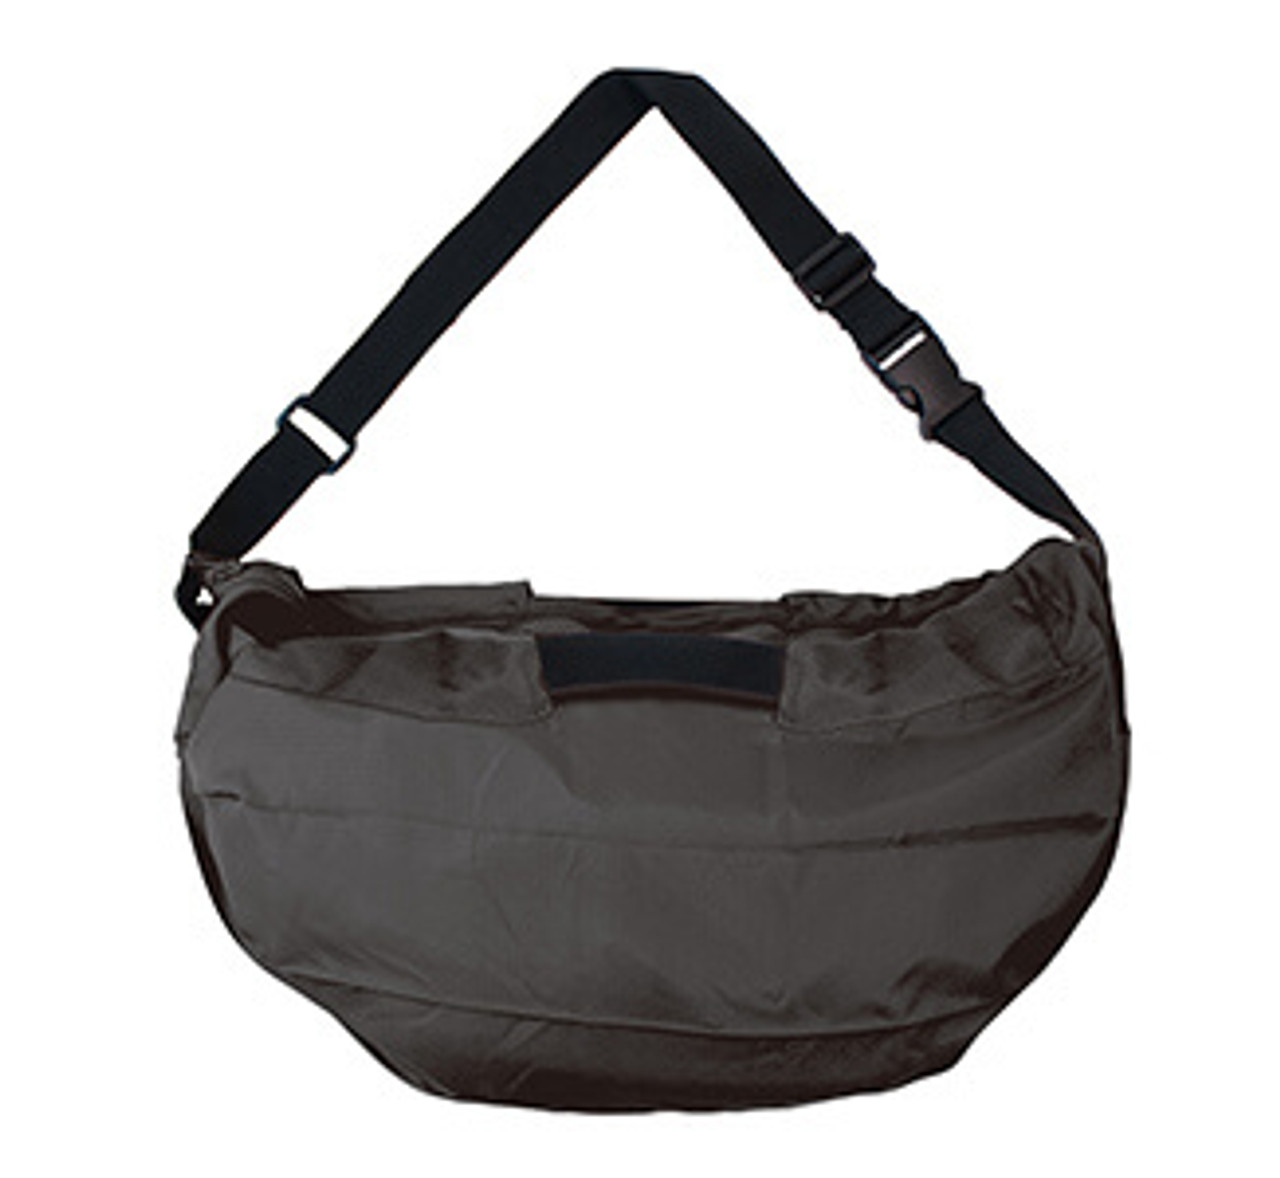 Marna Shupatto Shoulder Bag 2Way Black Складная сумка через плечо